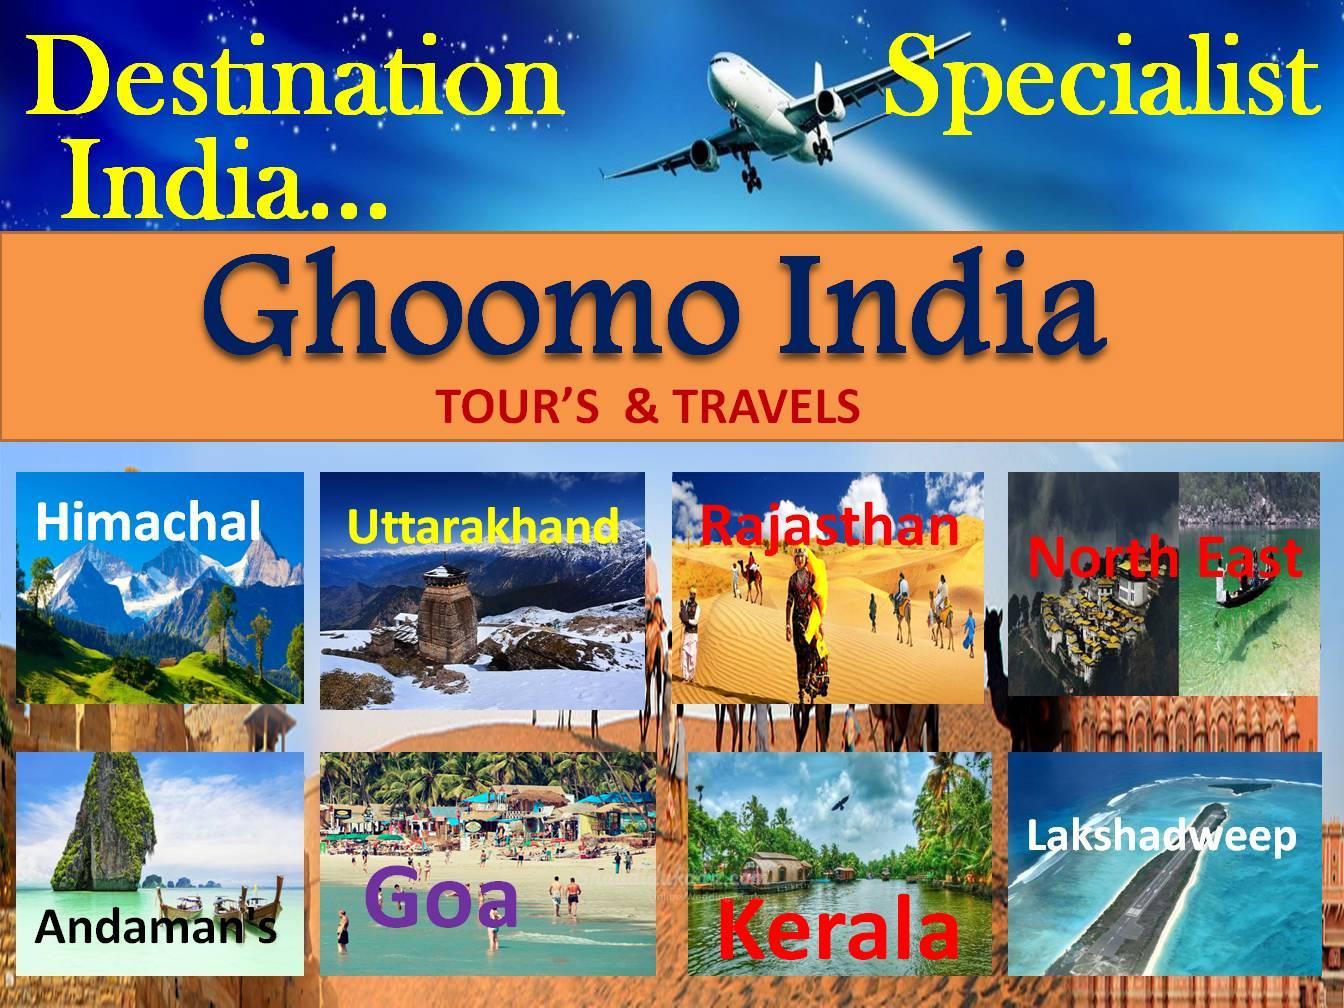 Ghoomo India Travels